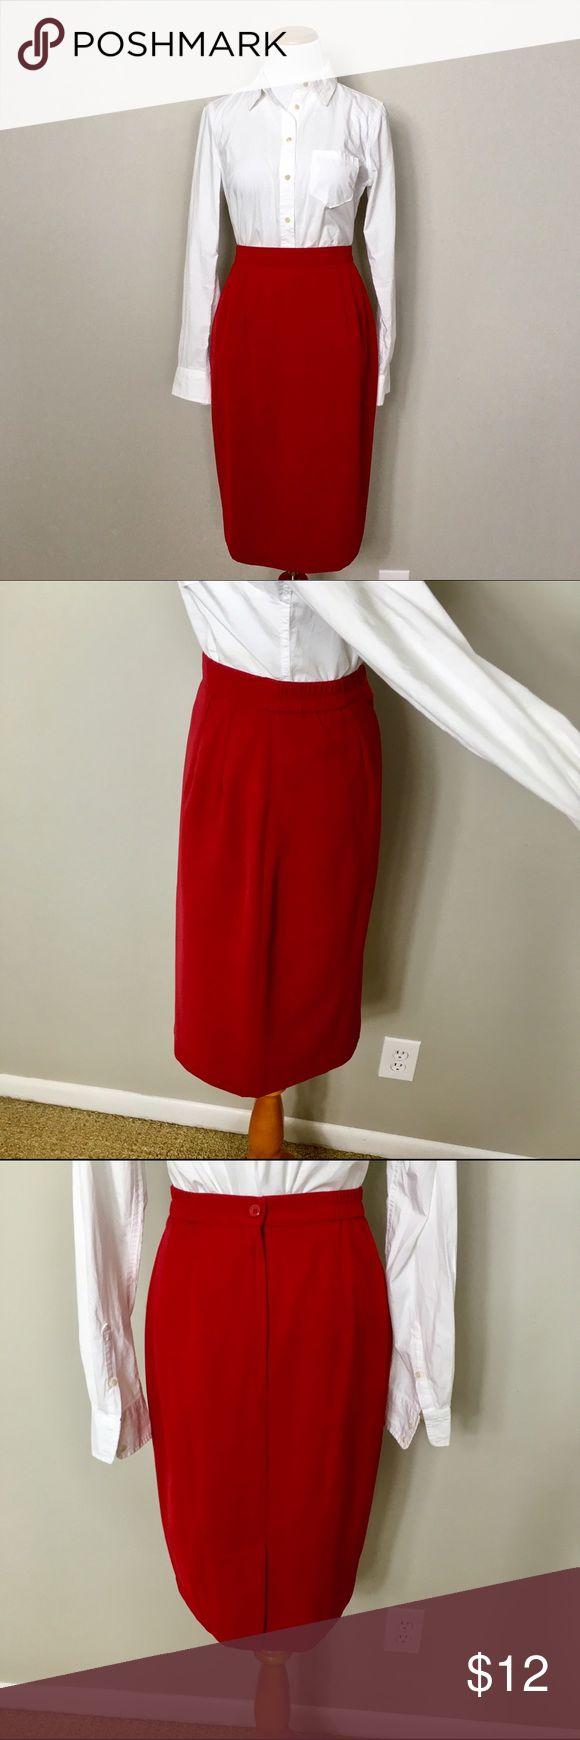 Vintage red pencil skirt Vintage red pencil skirt. Similar to modcloth Skirts Pencil